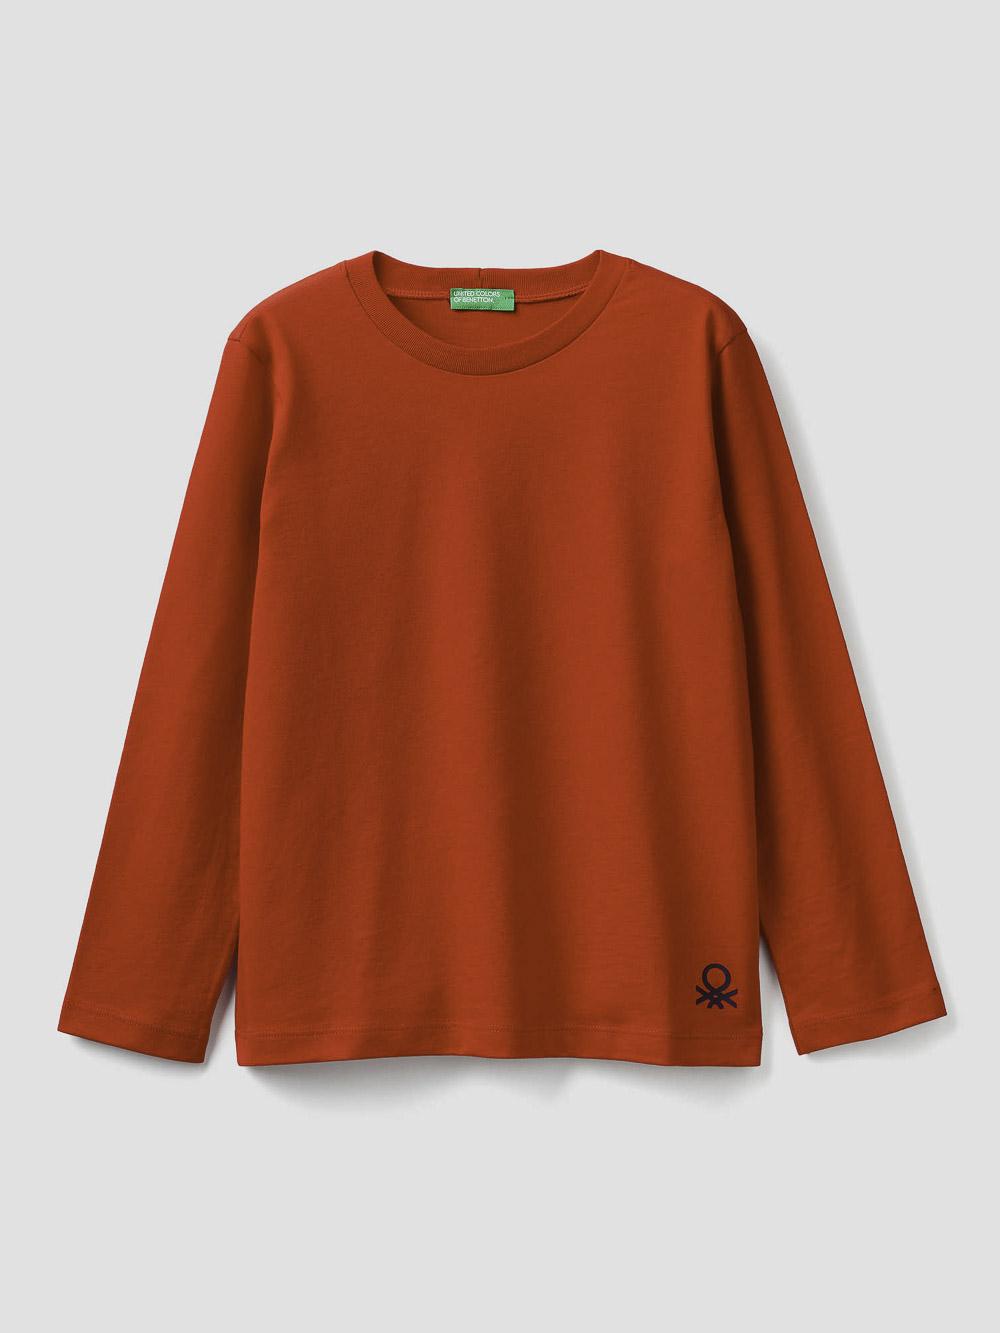 012 BENETTON T-shirt 100% οργανικό βαμβακερό 3I1XC14QD 20A015